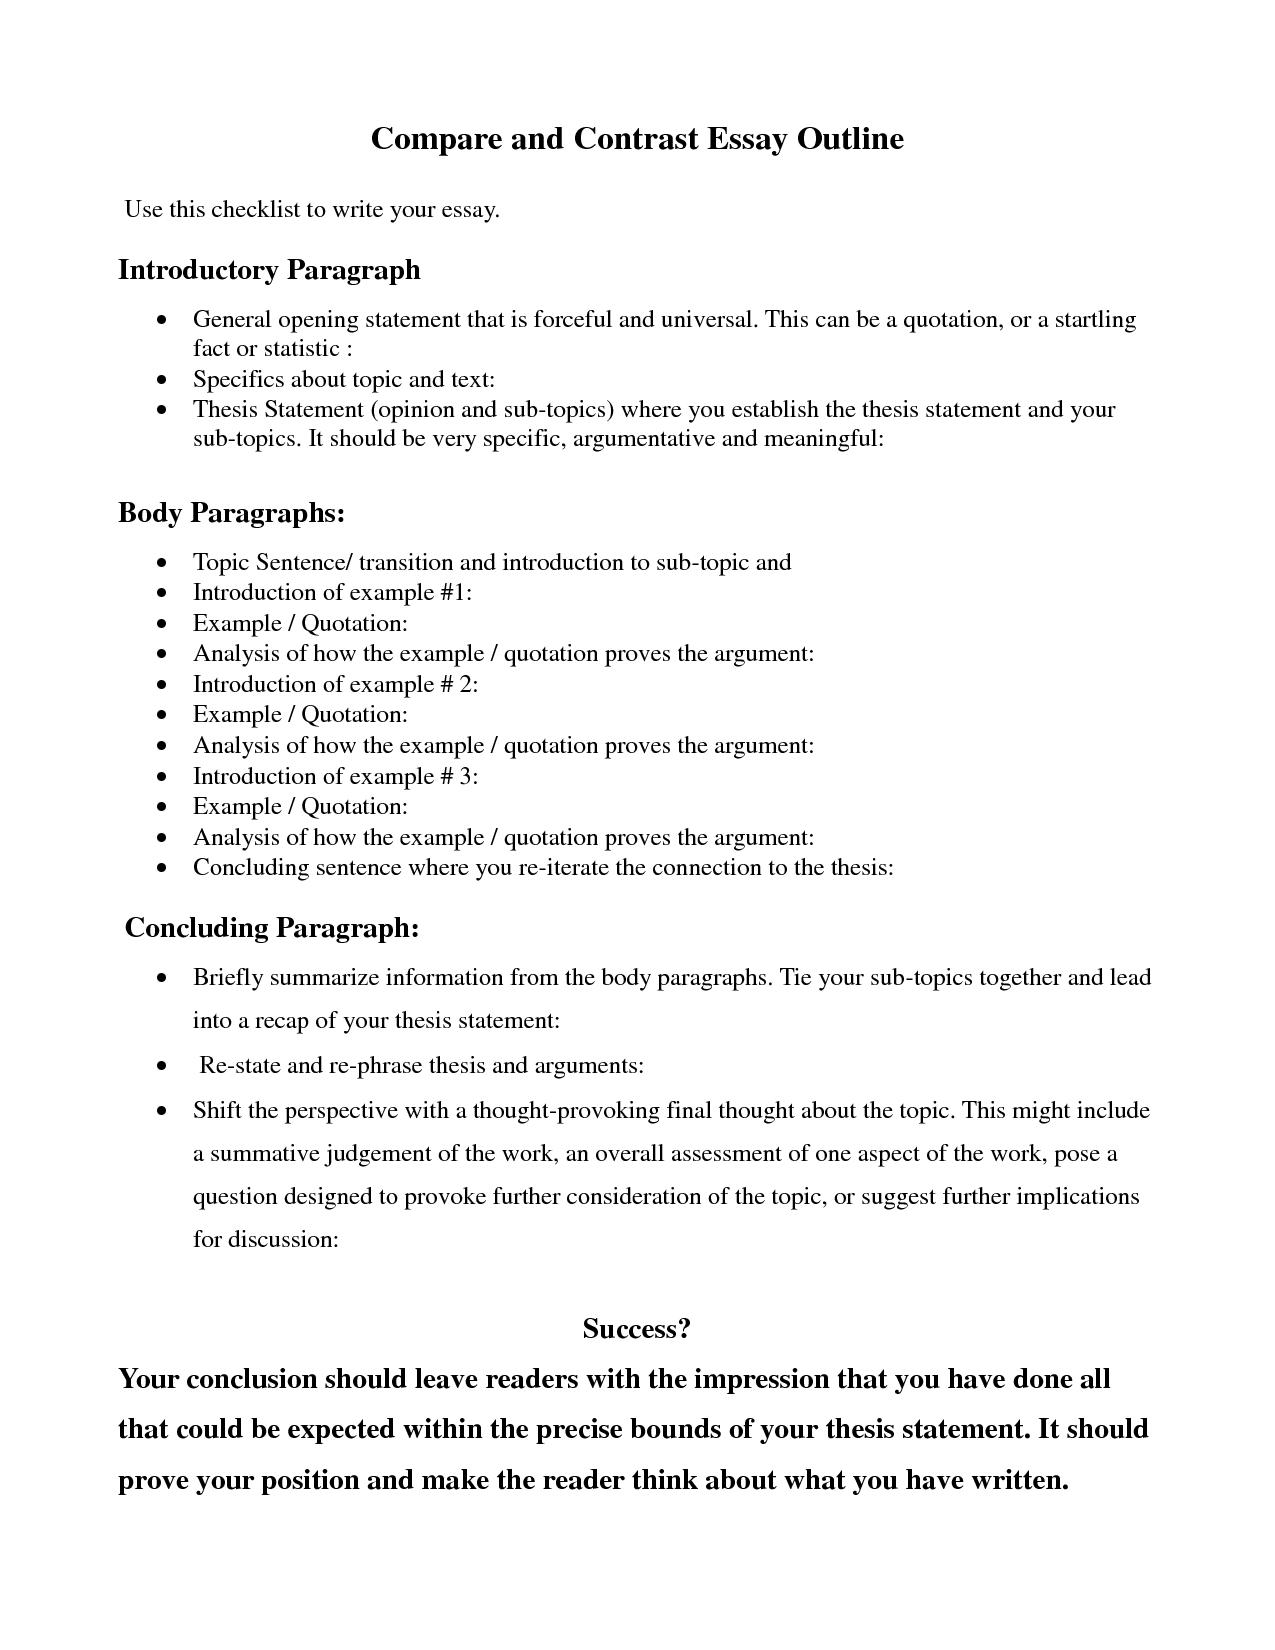 Compare Contrast Essay Outline